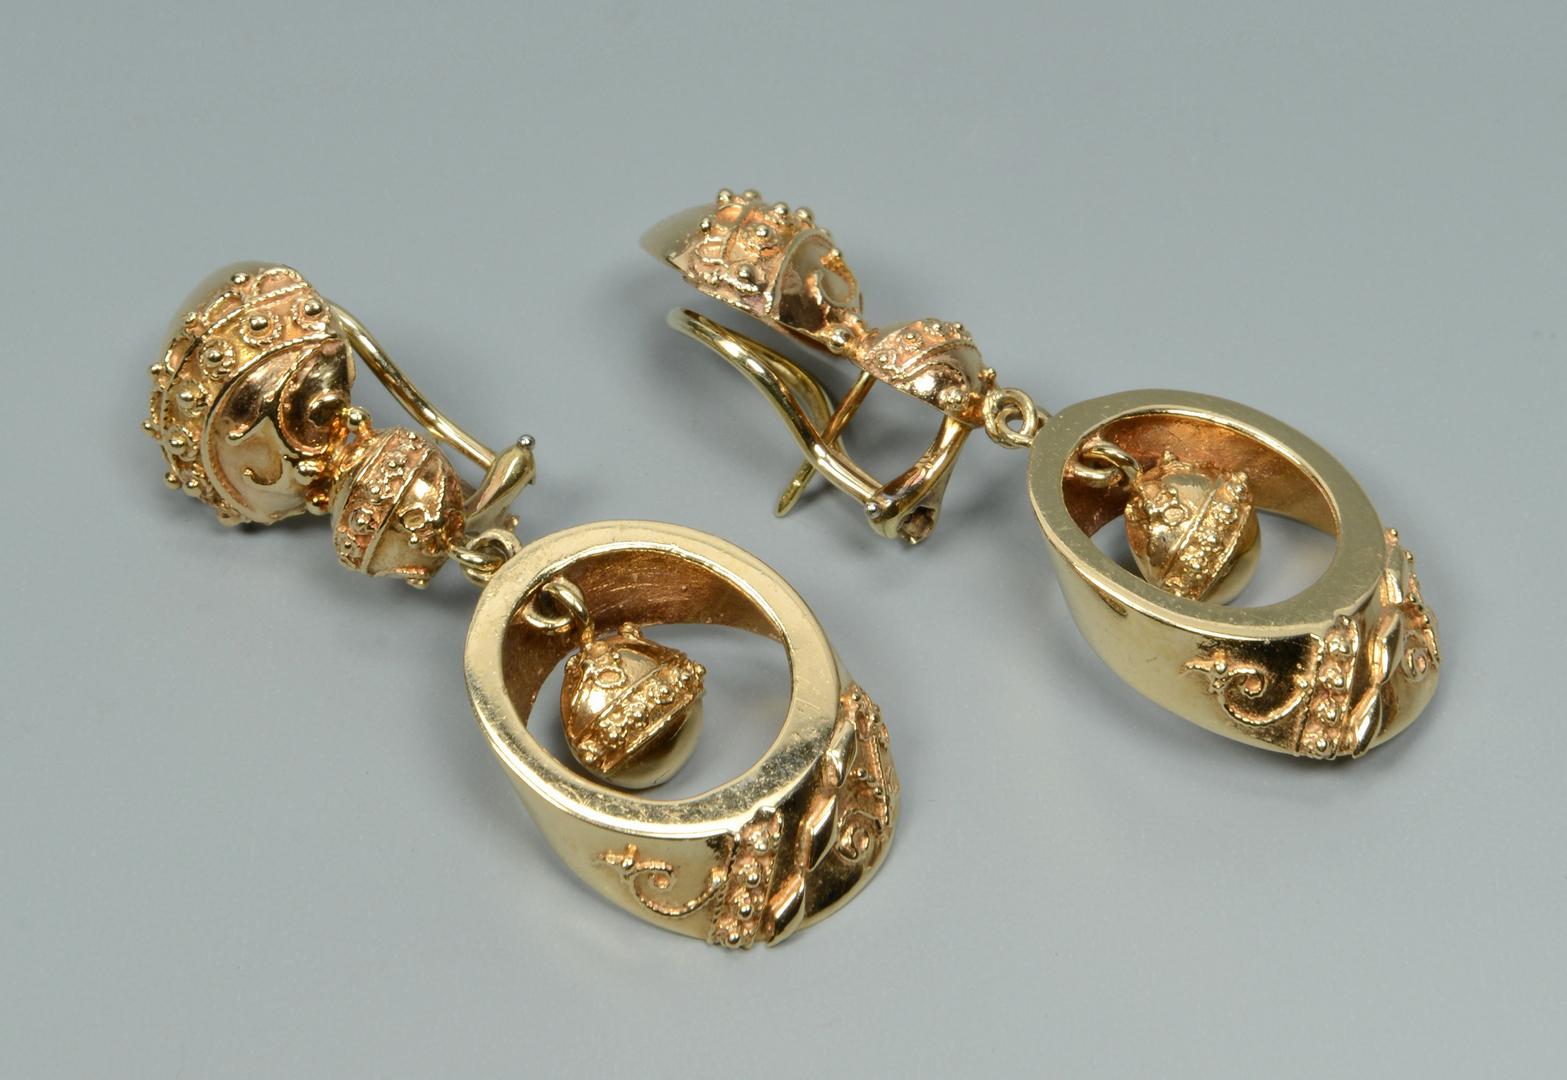 Lot 3088070: 2 Pair 14k Dangle Earrings